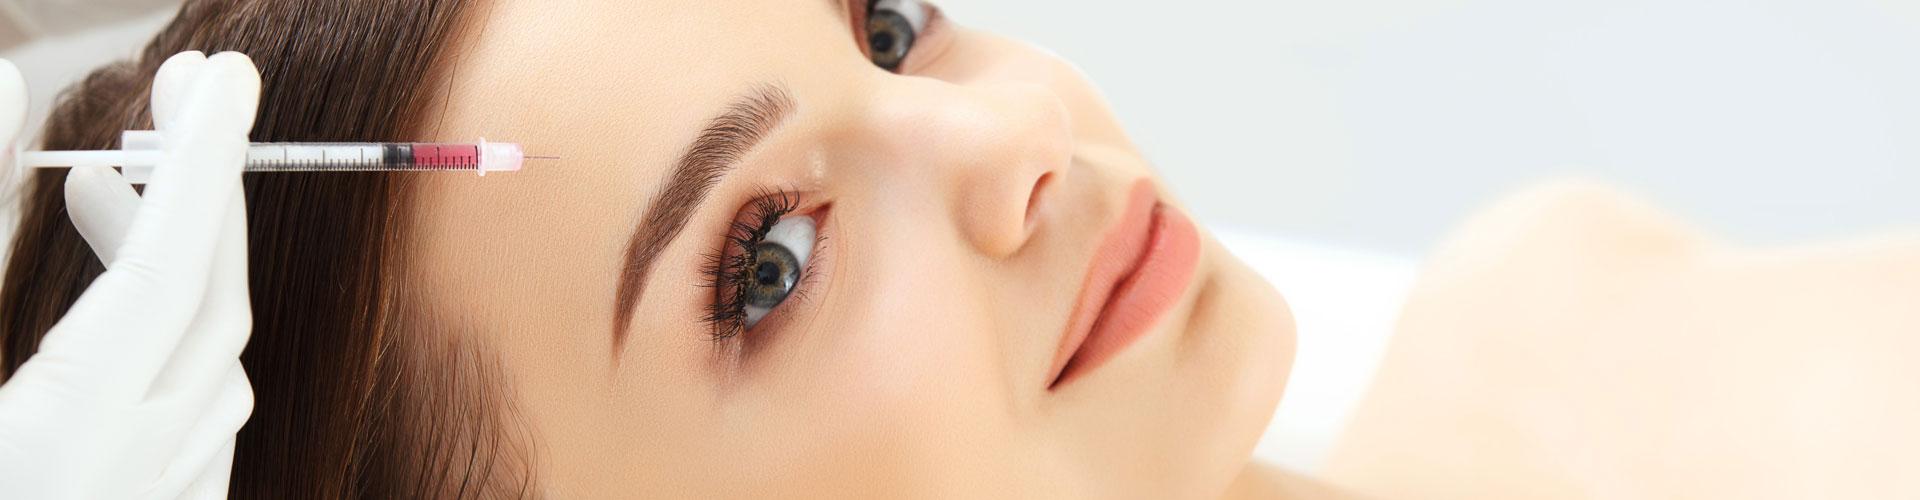 Botox at Evolve Skin Clinic Bolton